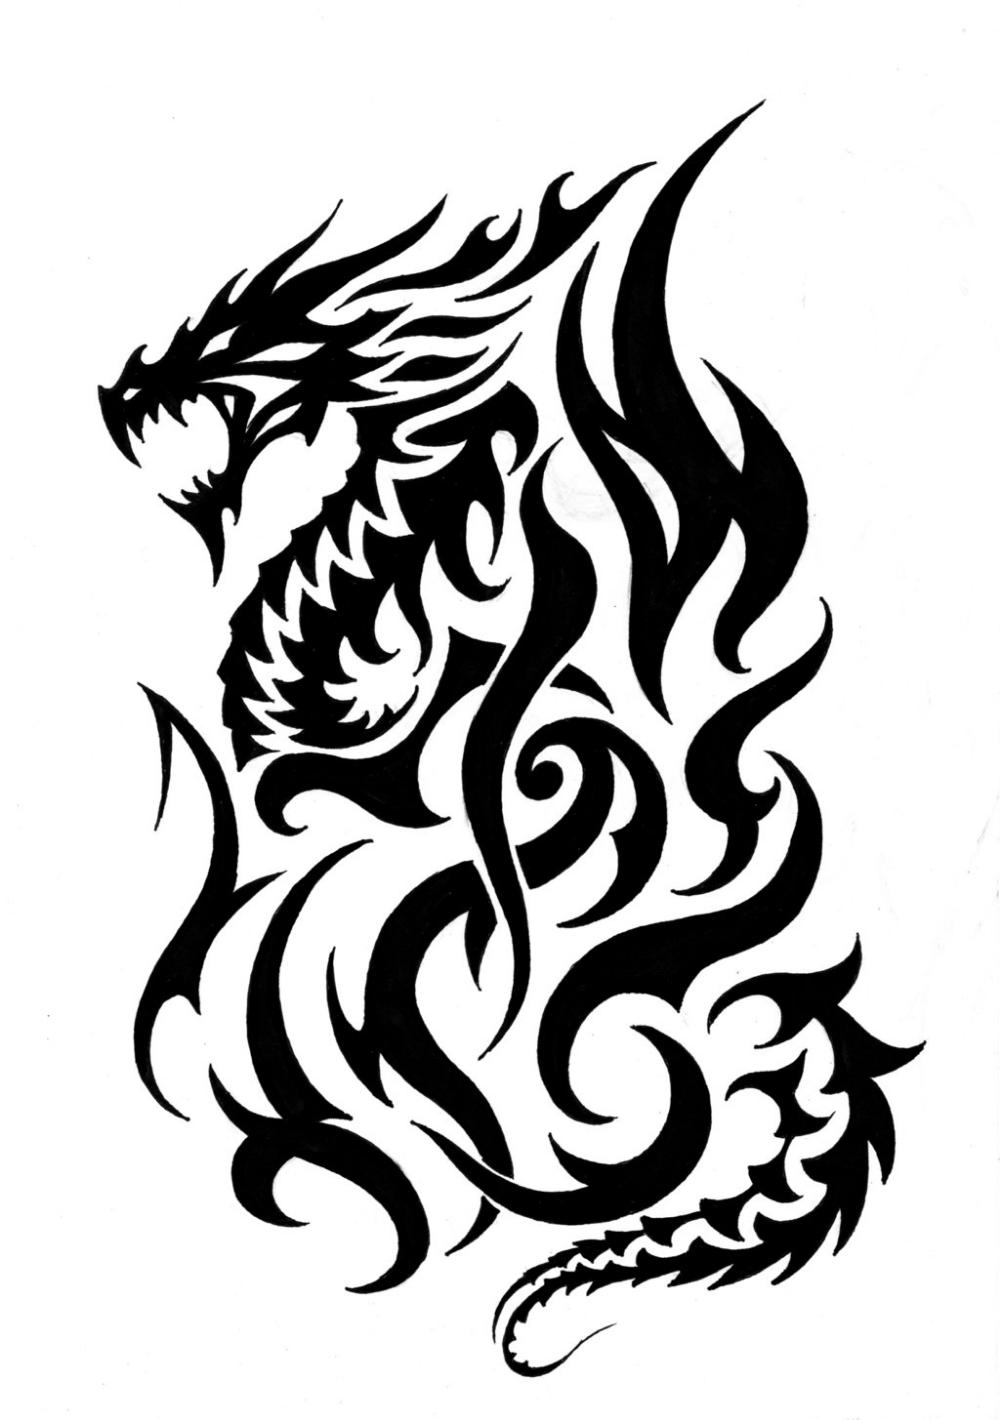 Tribal Fire Dragon Tattoos Designs Clipart Library Clip Art Library In 2020 Celtic Dragon Tattoos Tribal Dragon Tattoos Dragon Tattoo